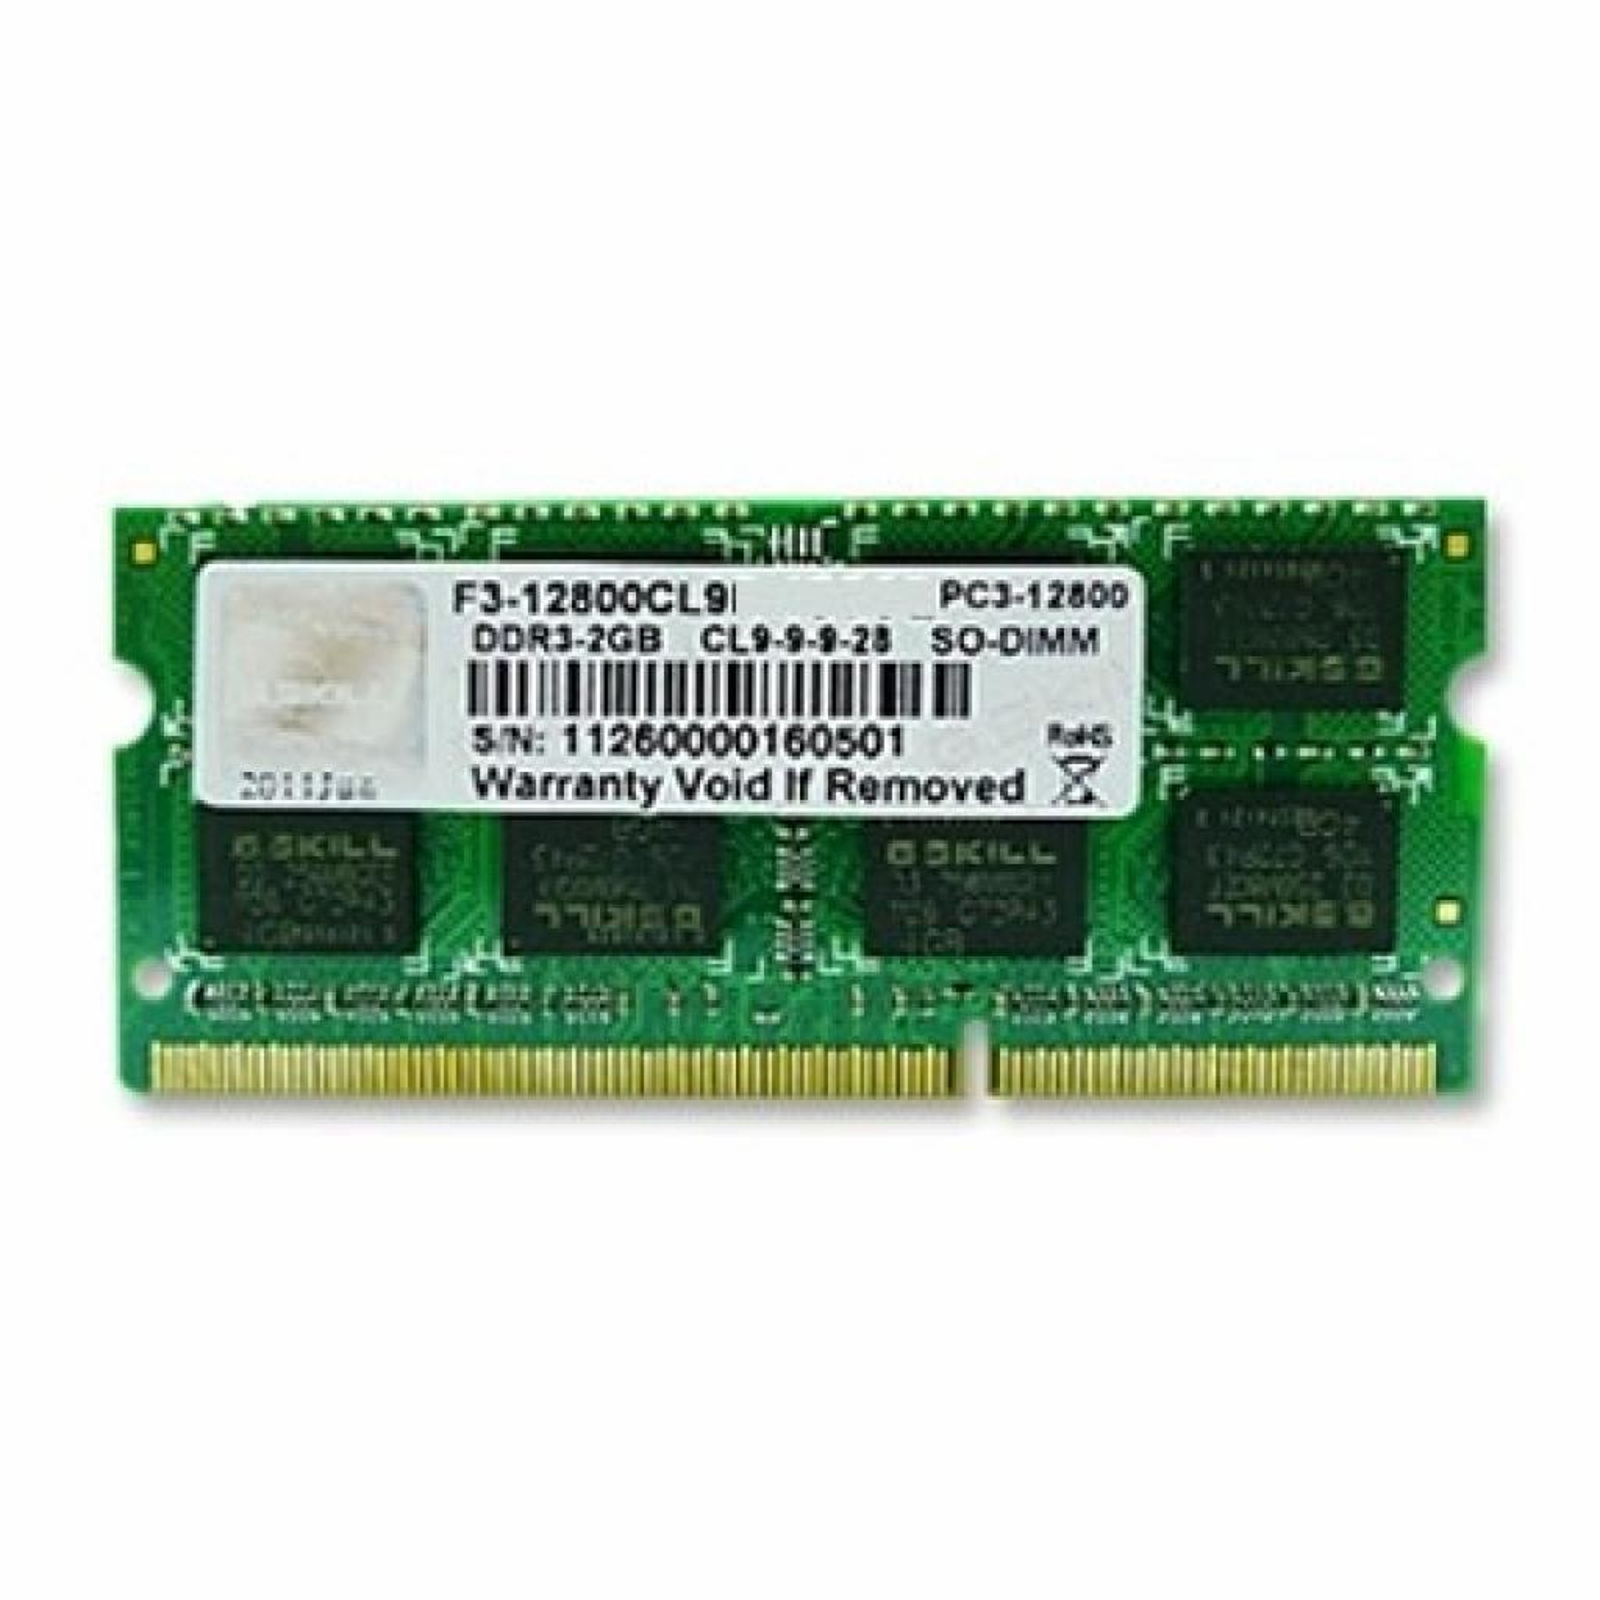 Модуль памяти для ноутбука SoDIMM DDR3 2GB 1600 MHz G.Skill (F3-12800CL9S-2GBSQ)